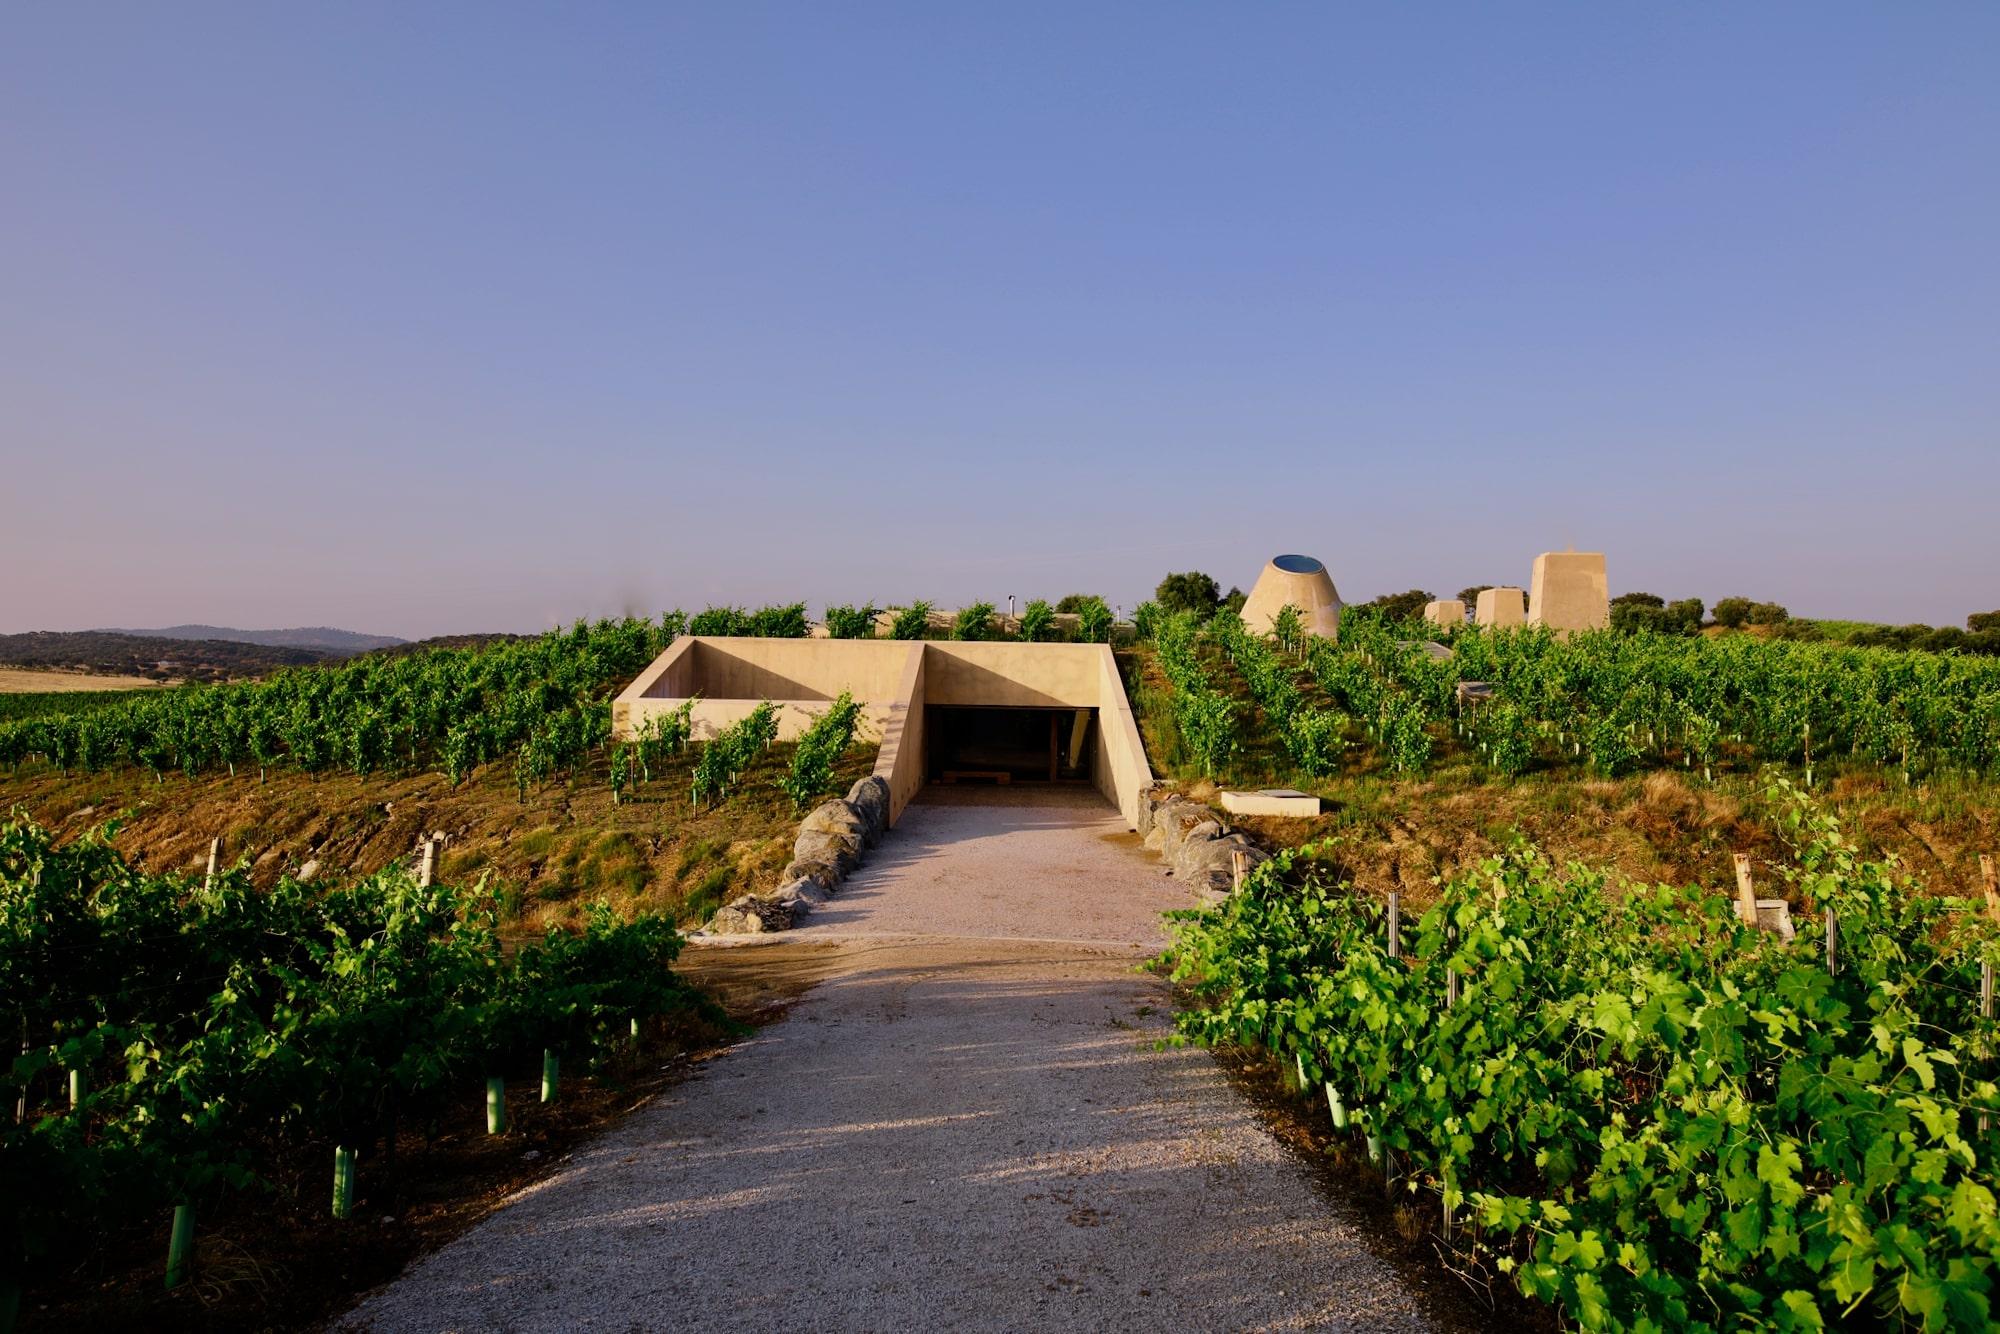 Herdade do Freixo – Visita & Prova 1 Vinho